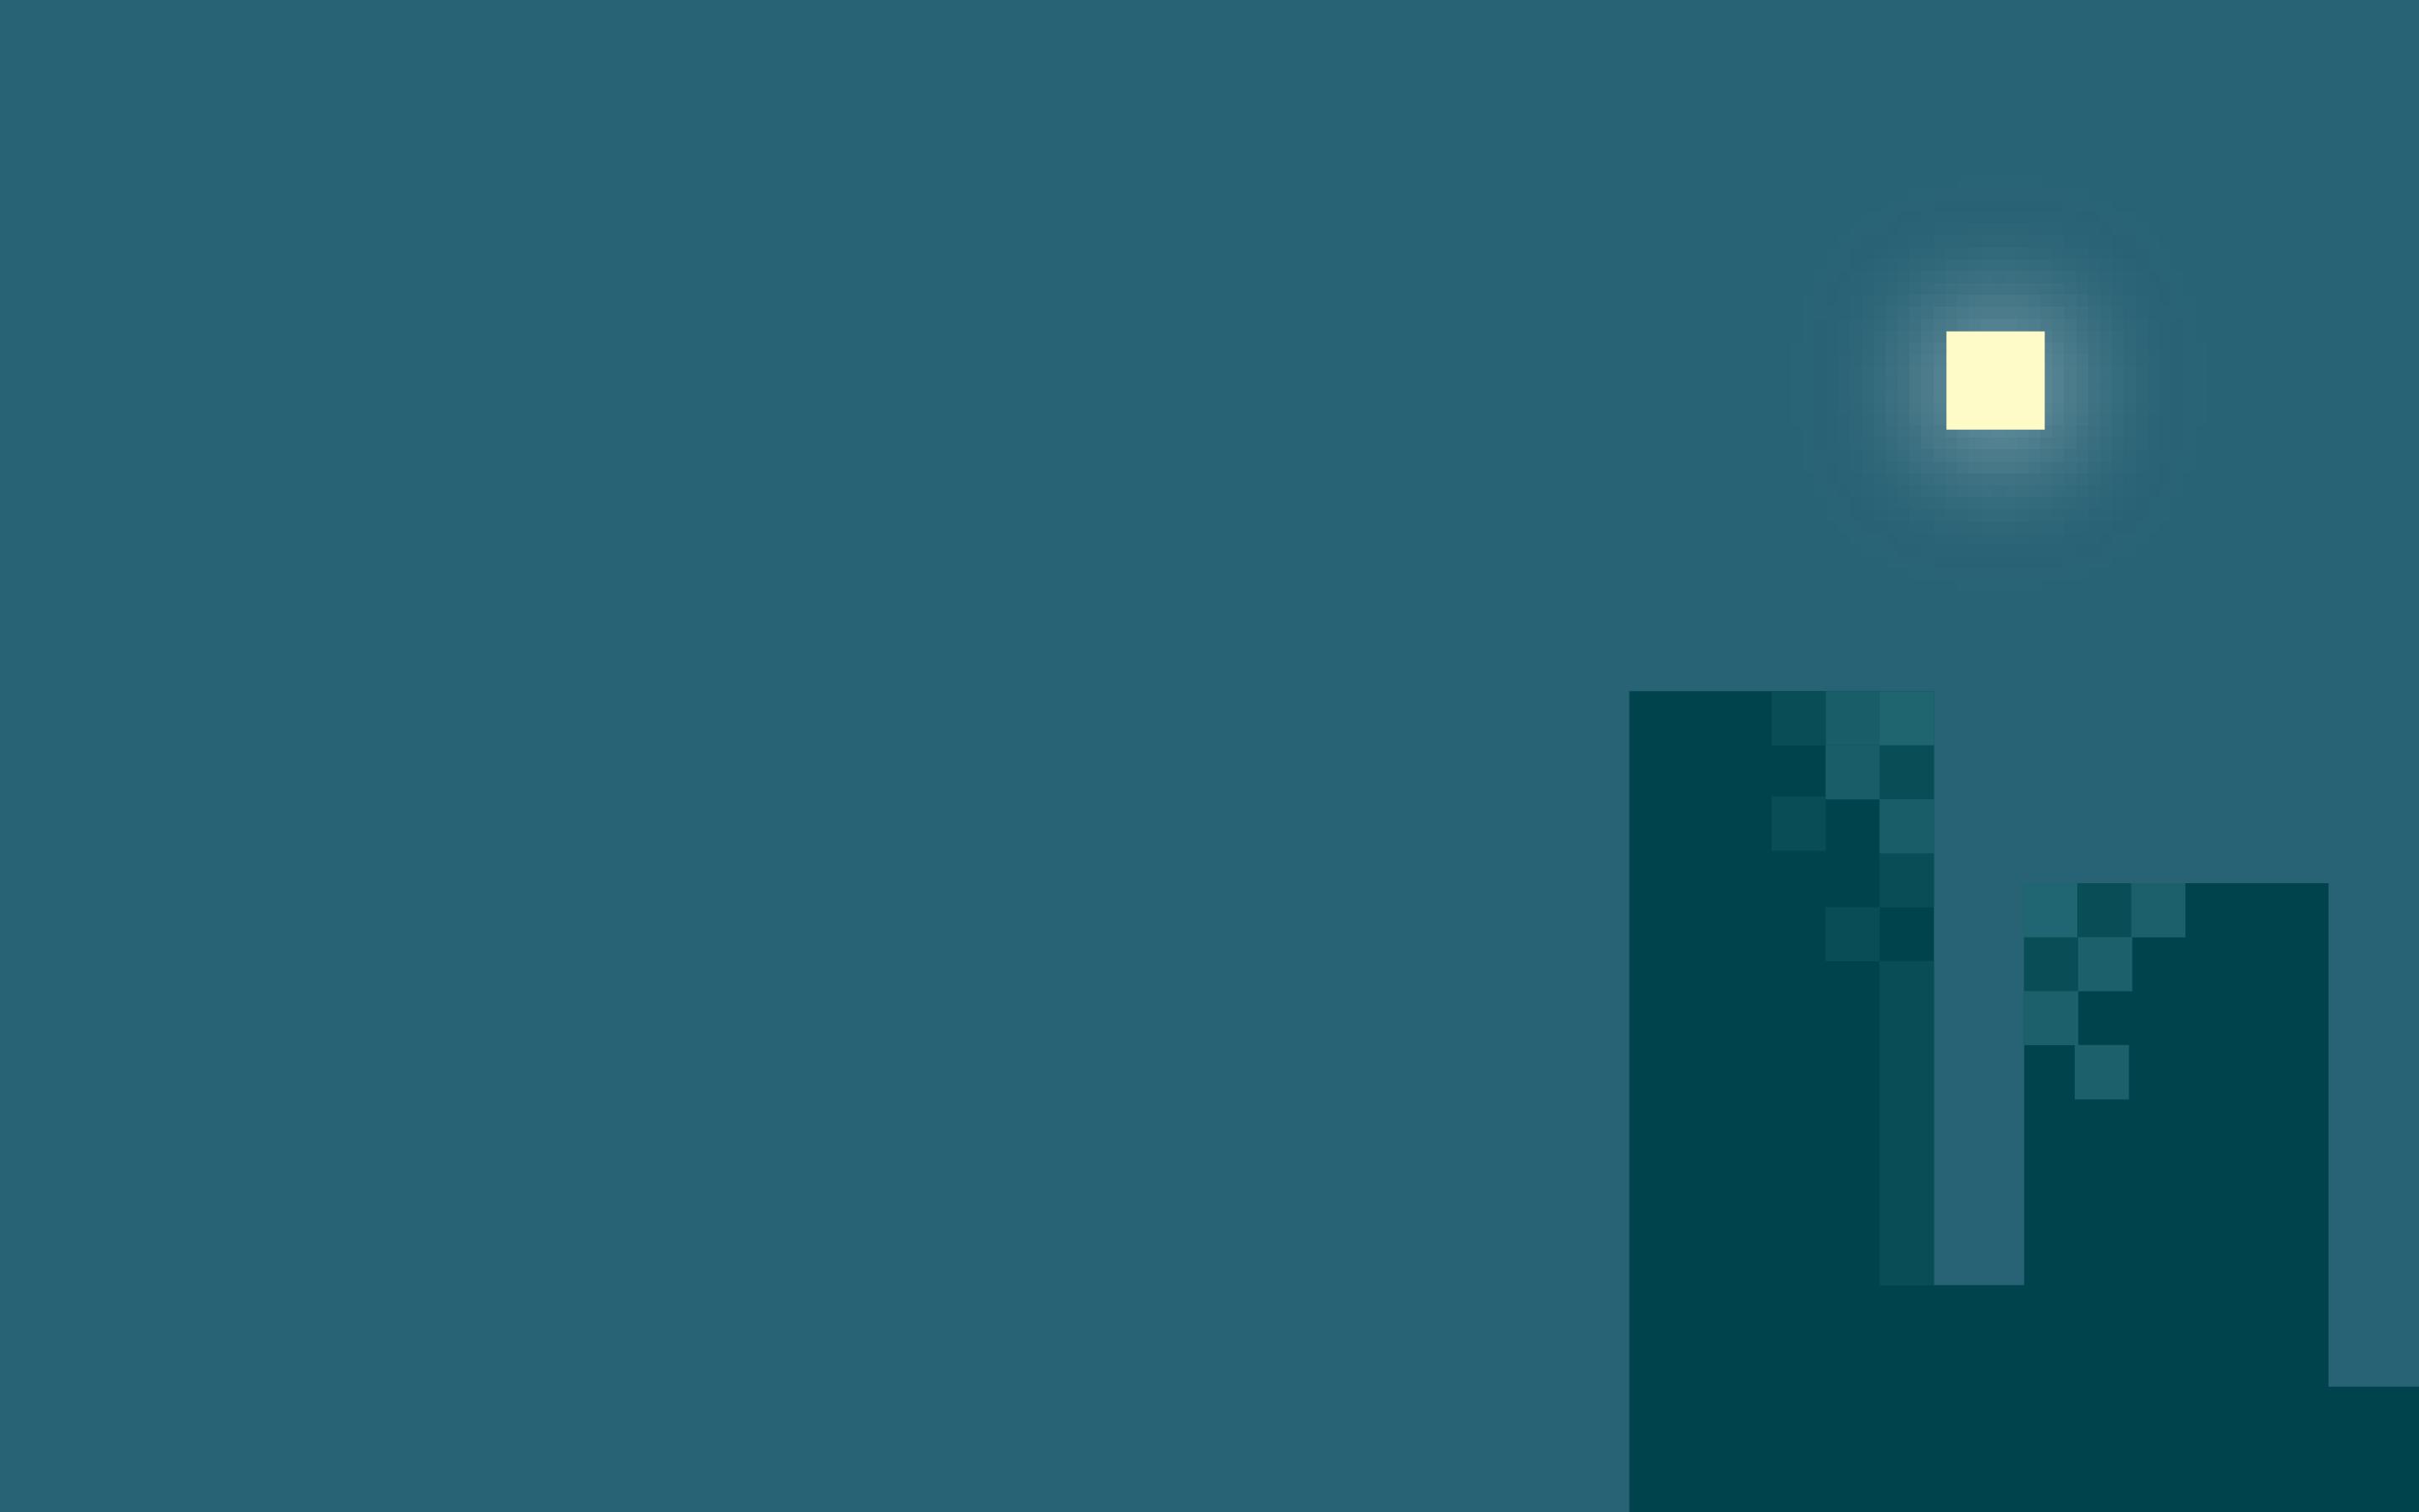 pixelart (1)